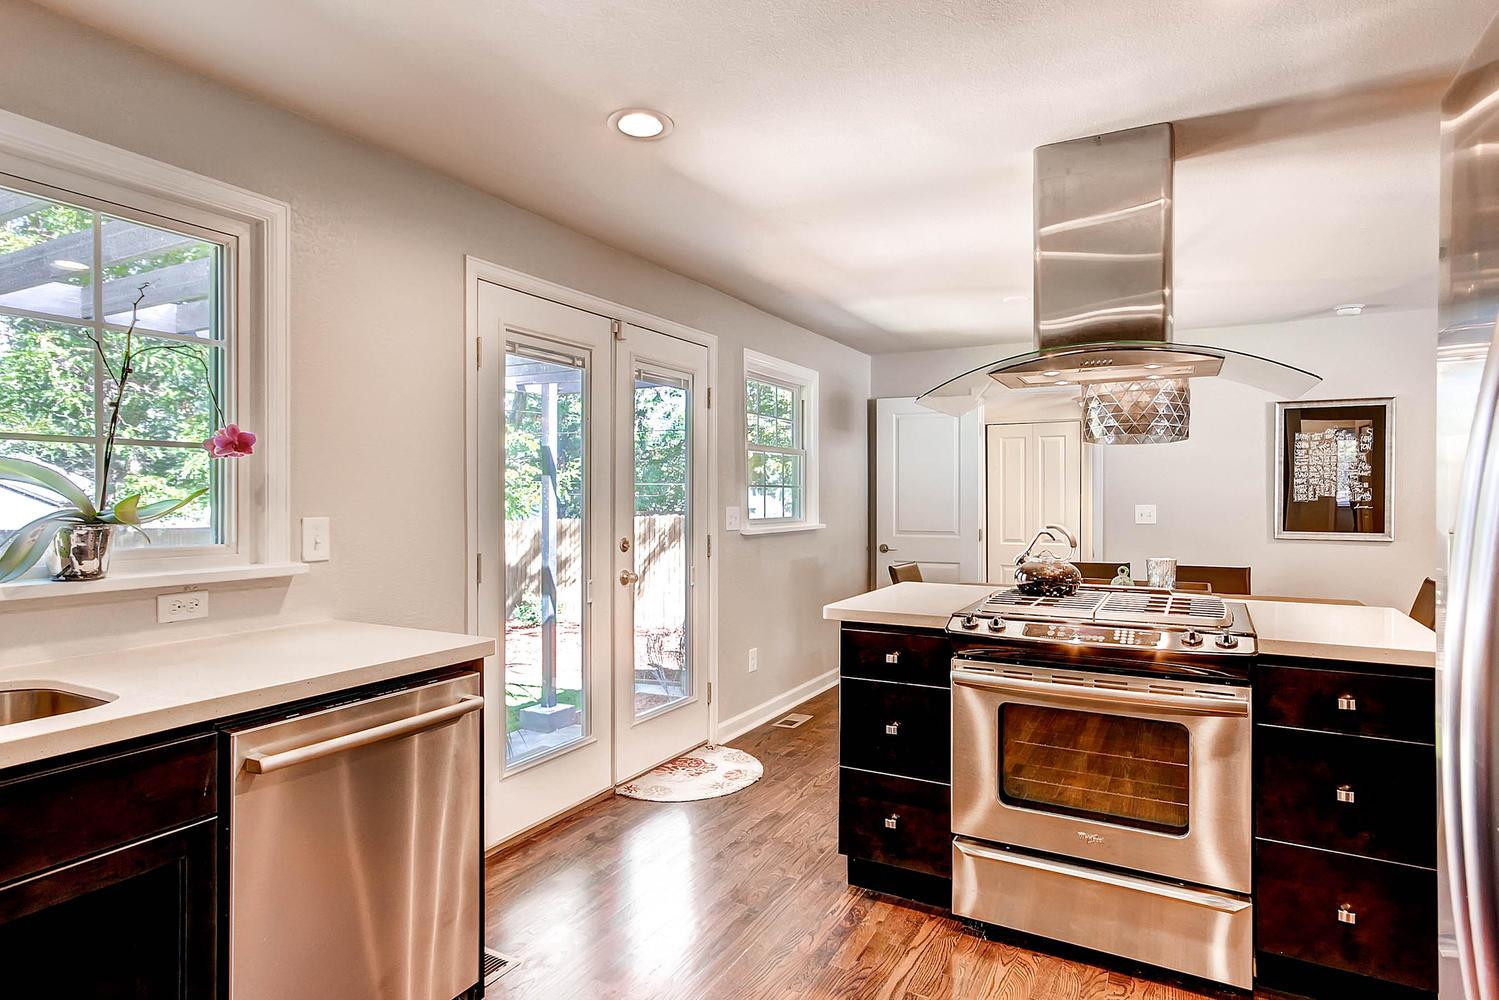 3297 S Lafayette St Englewood-large-013-Kitchen-1500x1000-72dpi.jpg